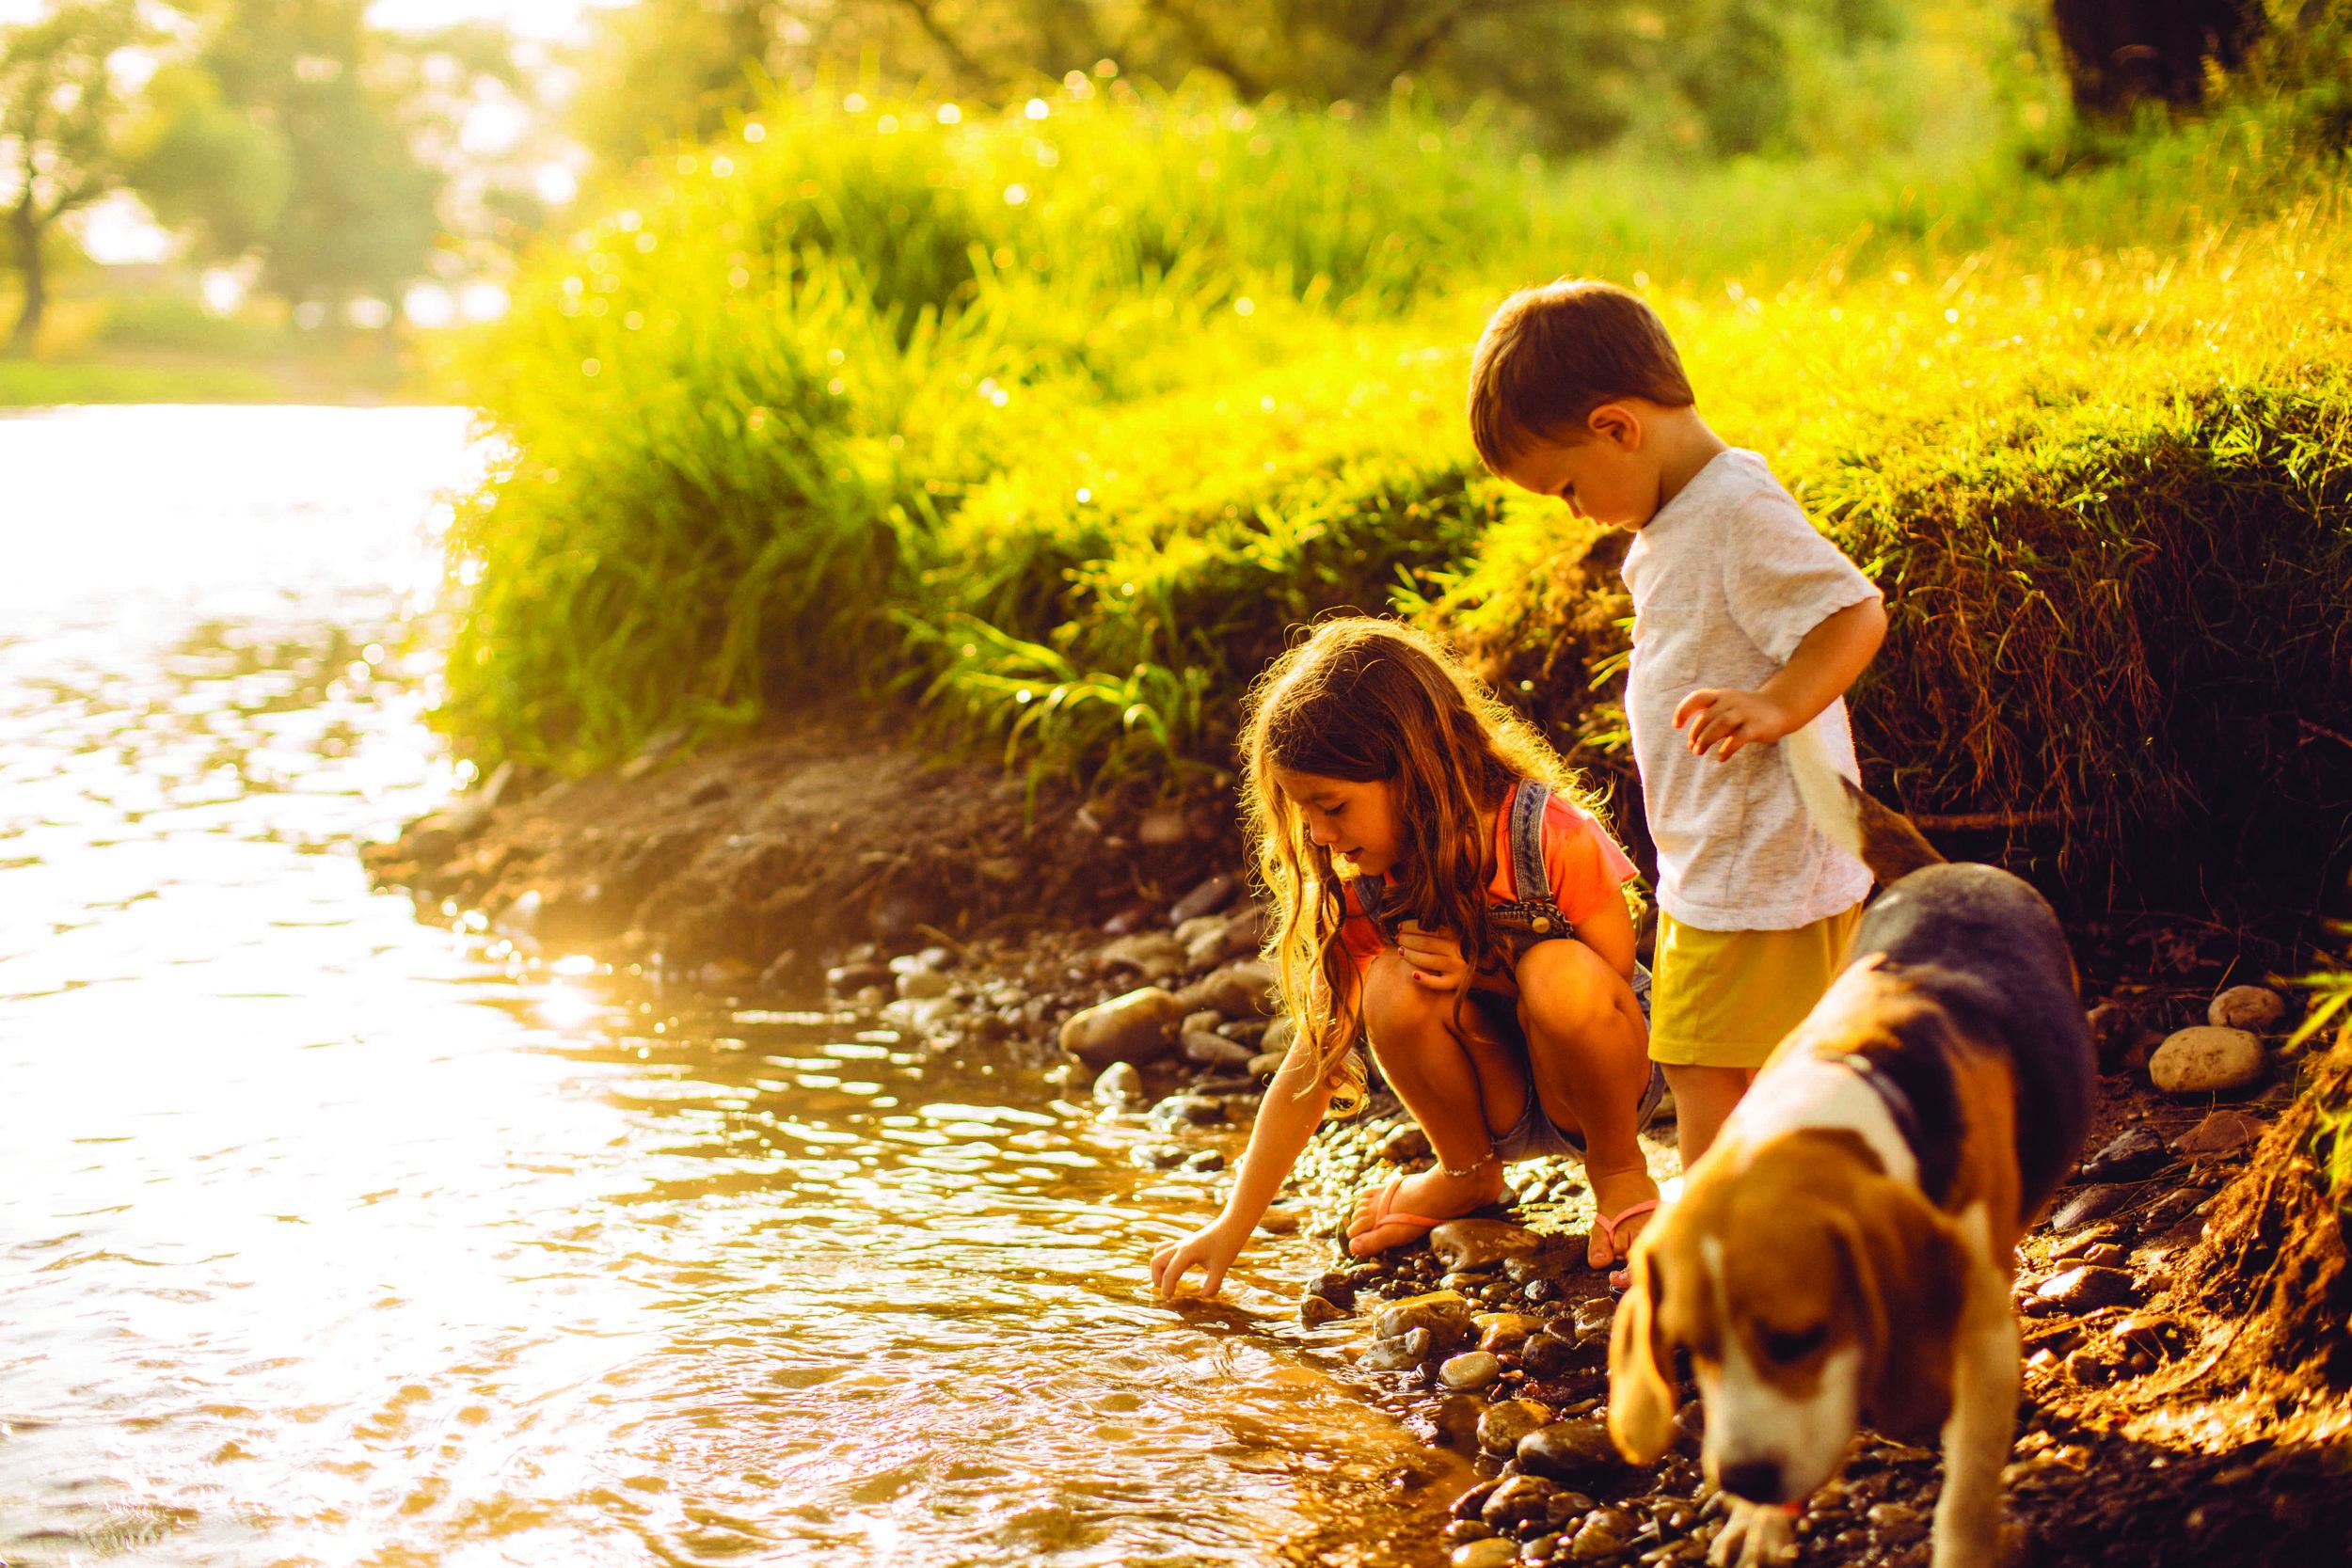 Kids on River Bank LR.jpg